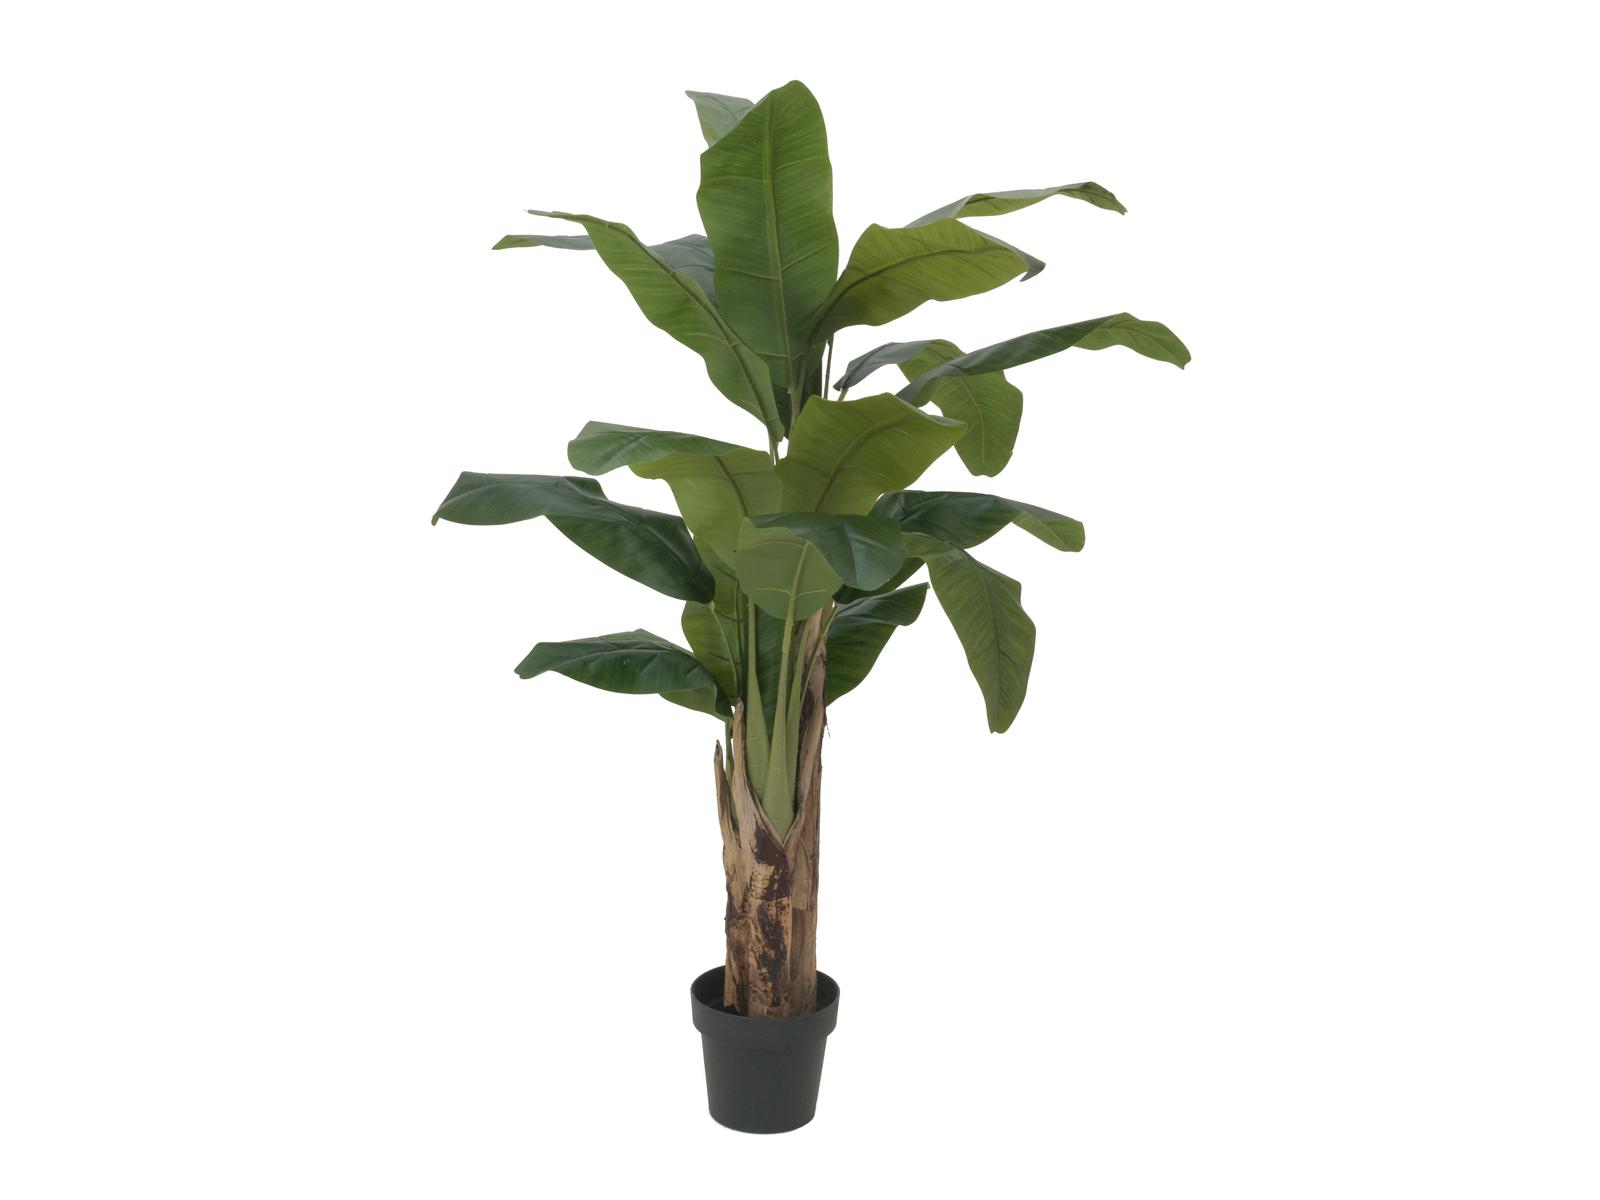 Banánovník, 120 cm